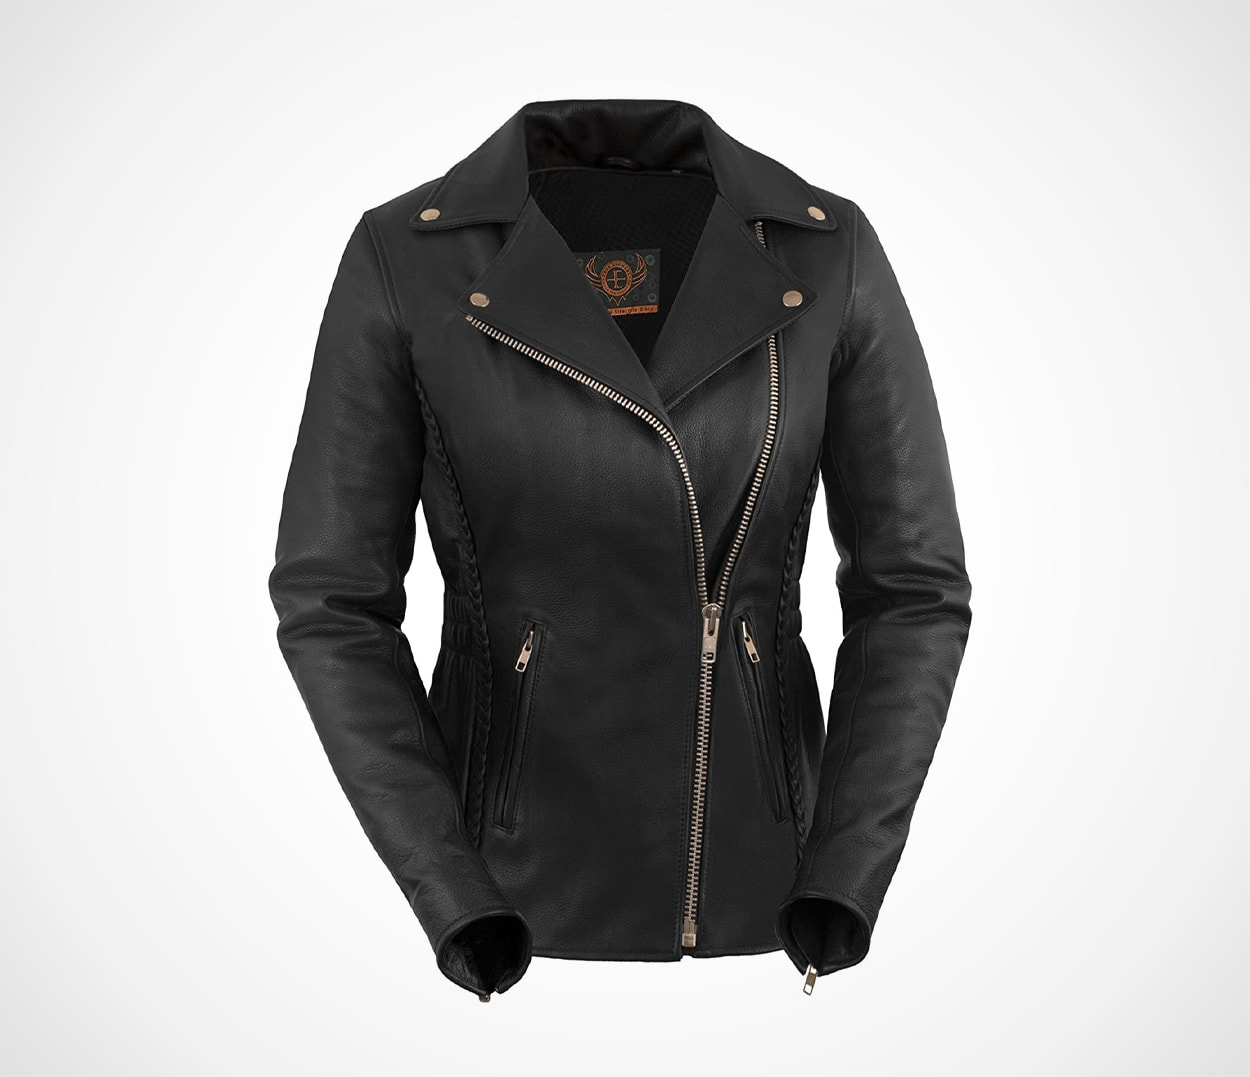 Women's Premium Braided Motorcycle Black Leather Jacket